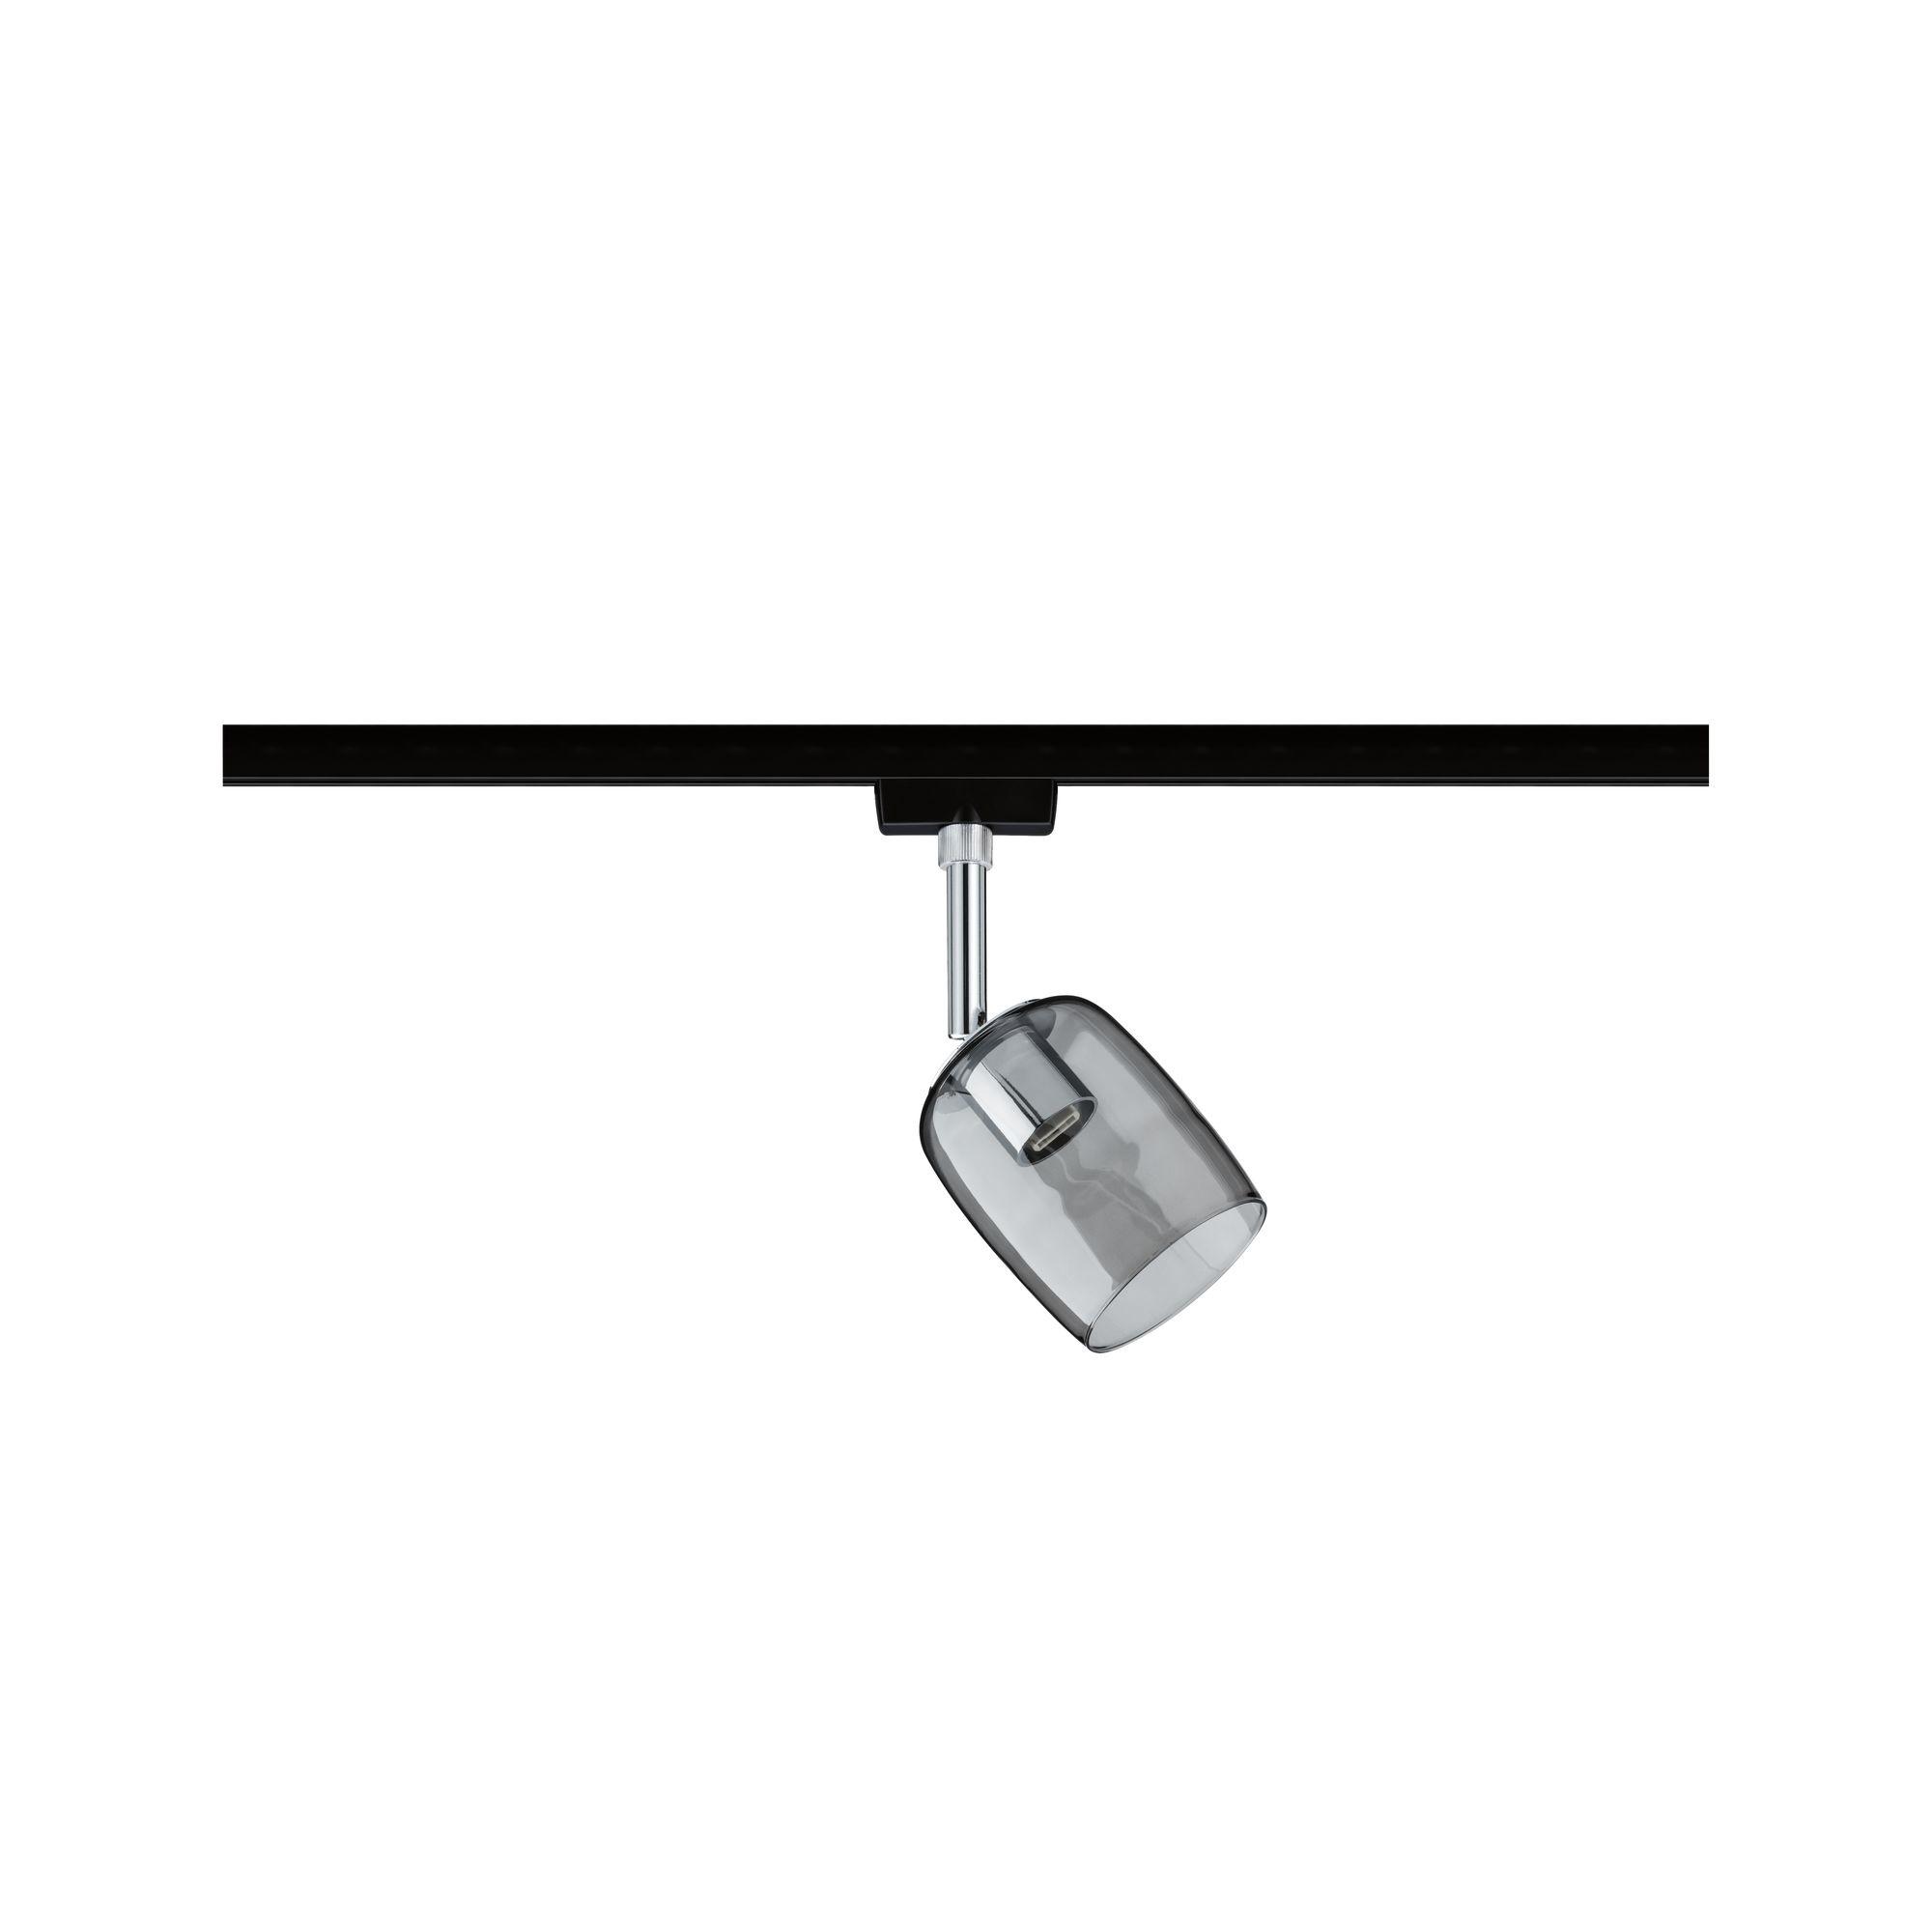 Paulmann URail Spot Blossom Schwarz/Matt Rauchglas max. 1x10W GU10 ohne Leuchtmittel